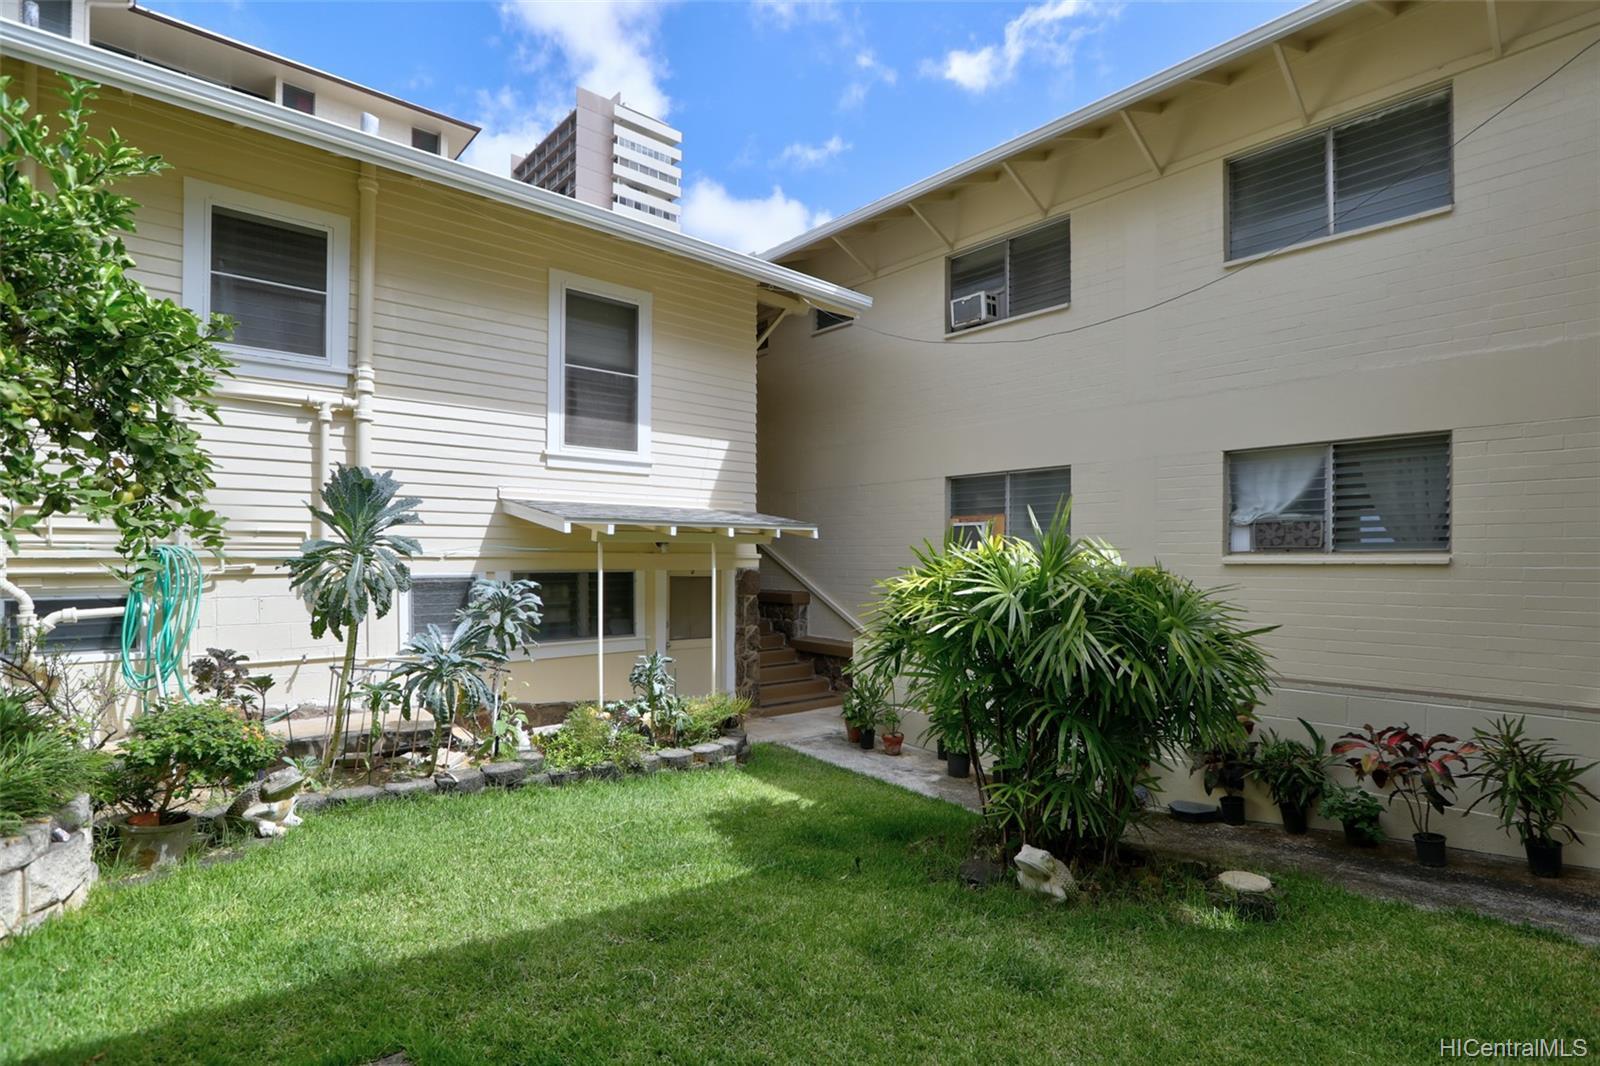 810 Green Street Honolulu - Multi-family - photo 24 of 25